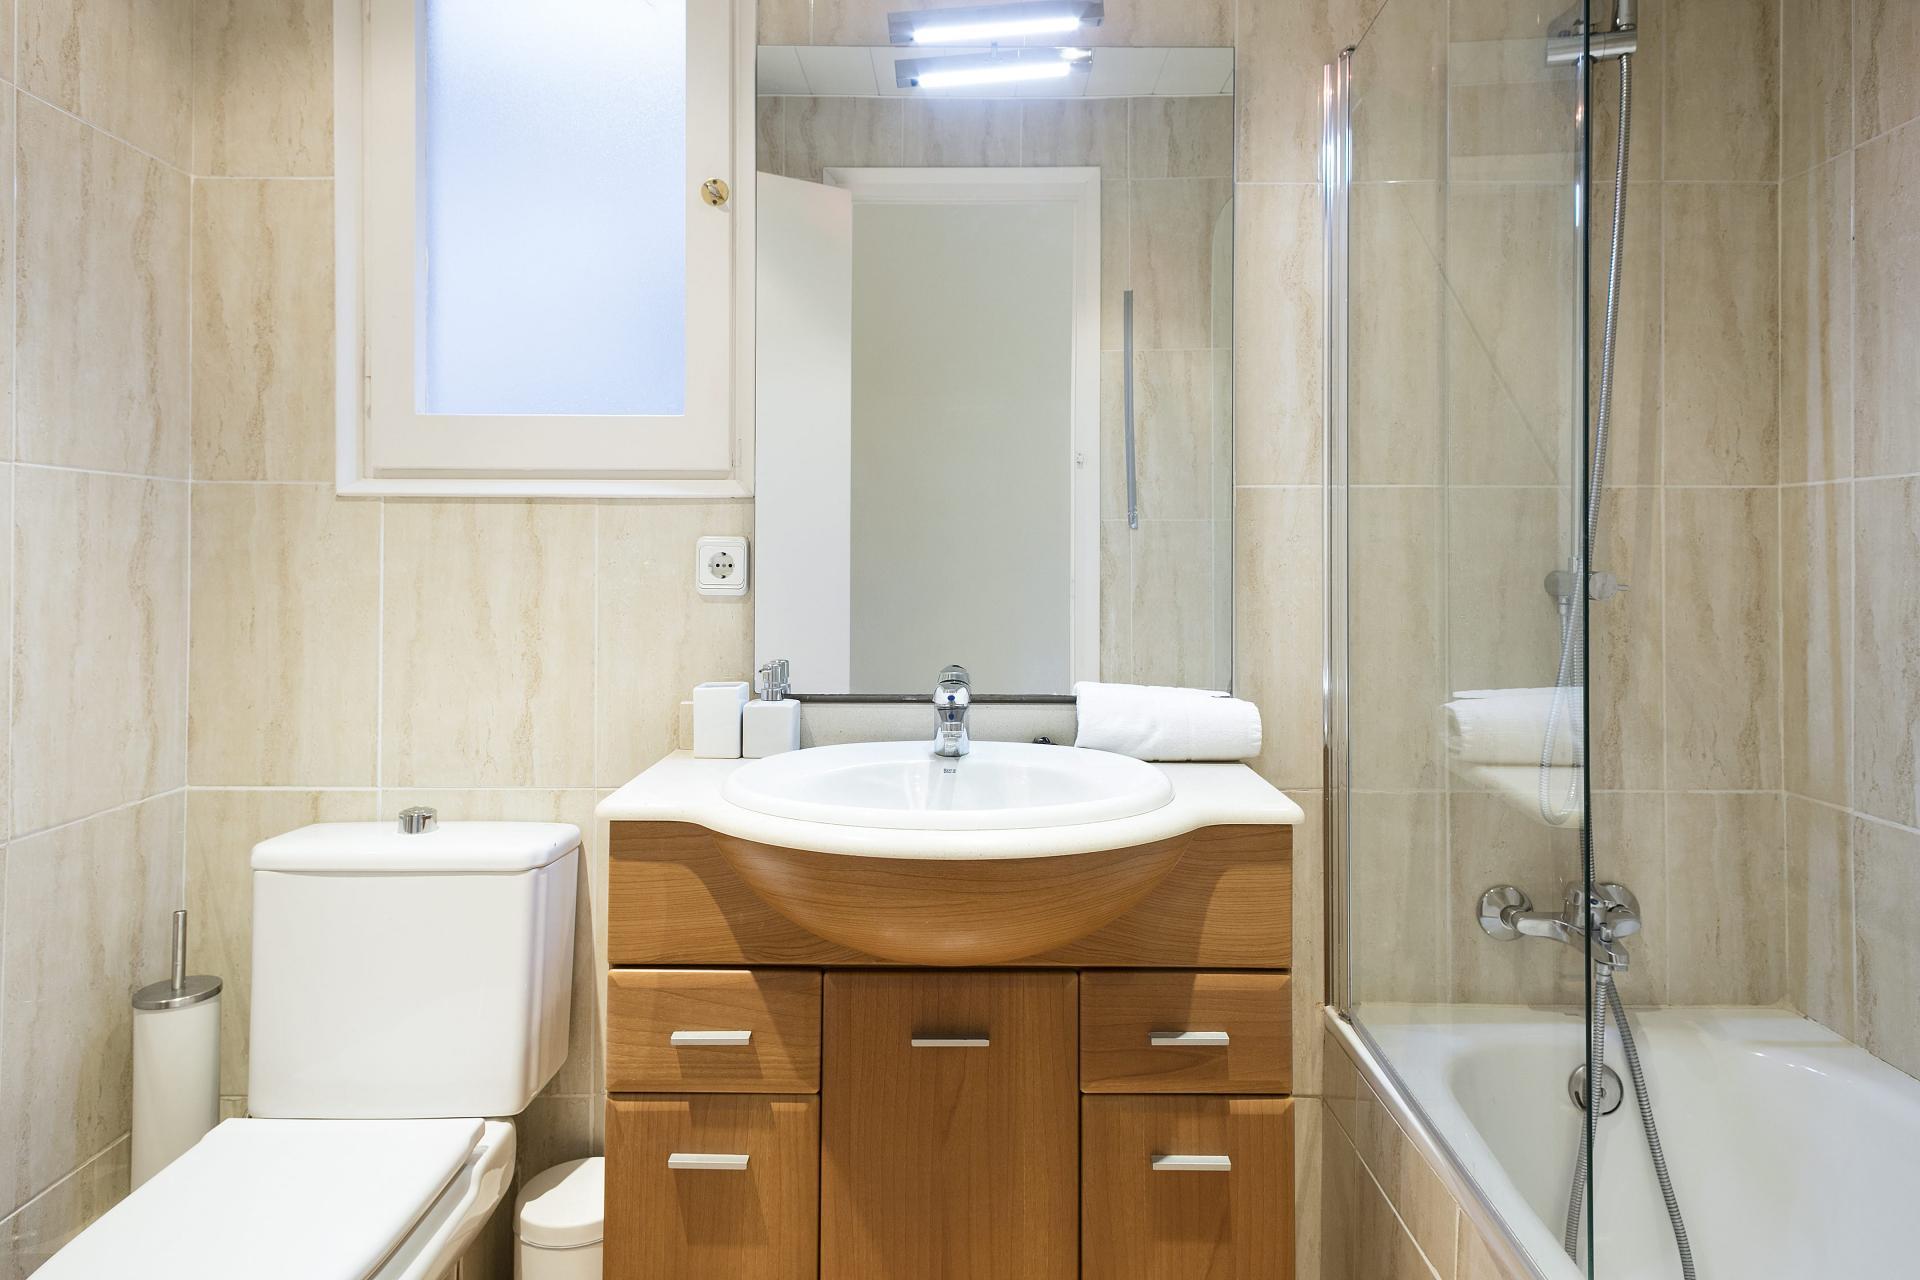 Bathroom at Sunny Serviced Apartments, Eixample, Barcelona - Citybase Apartments